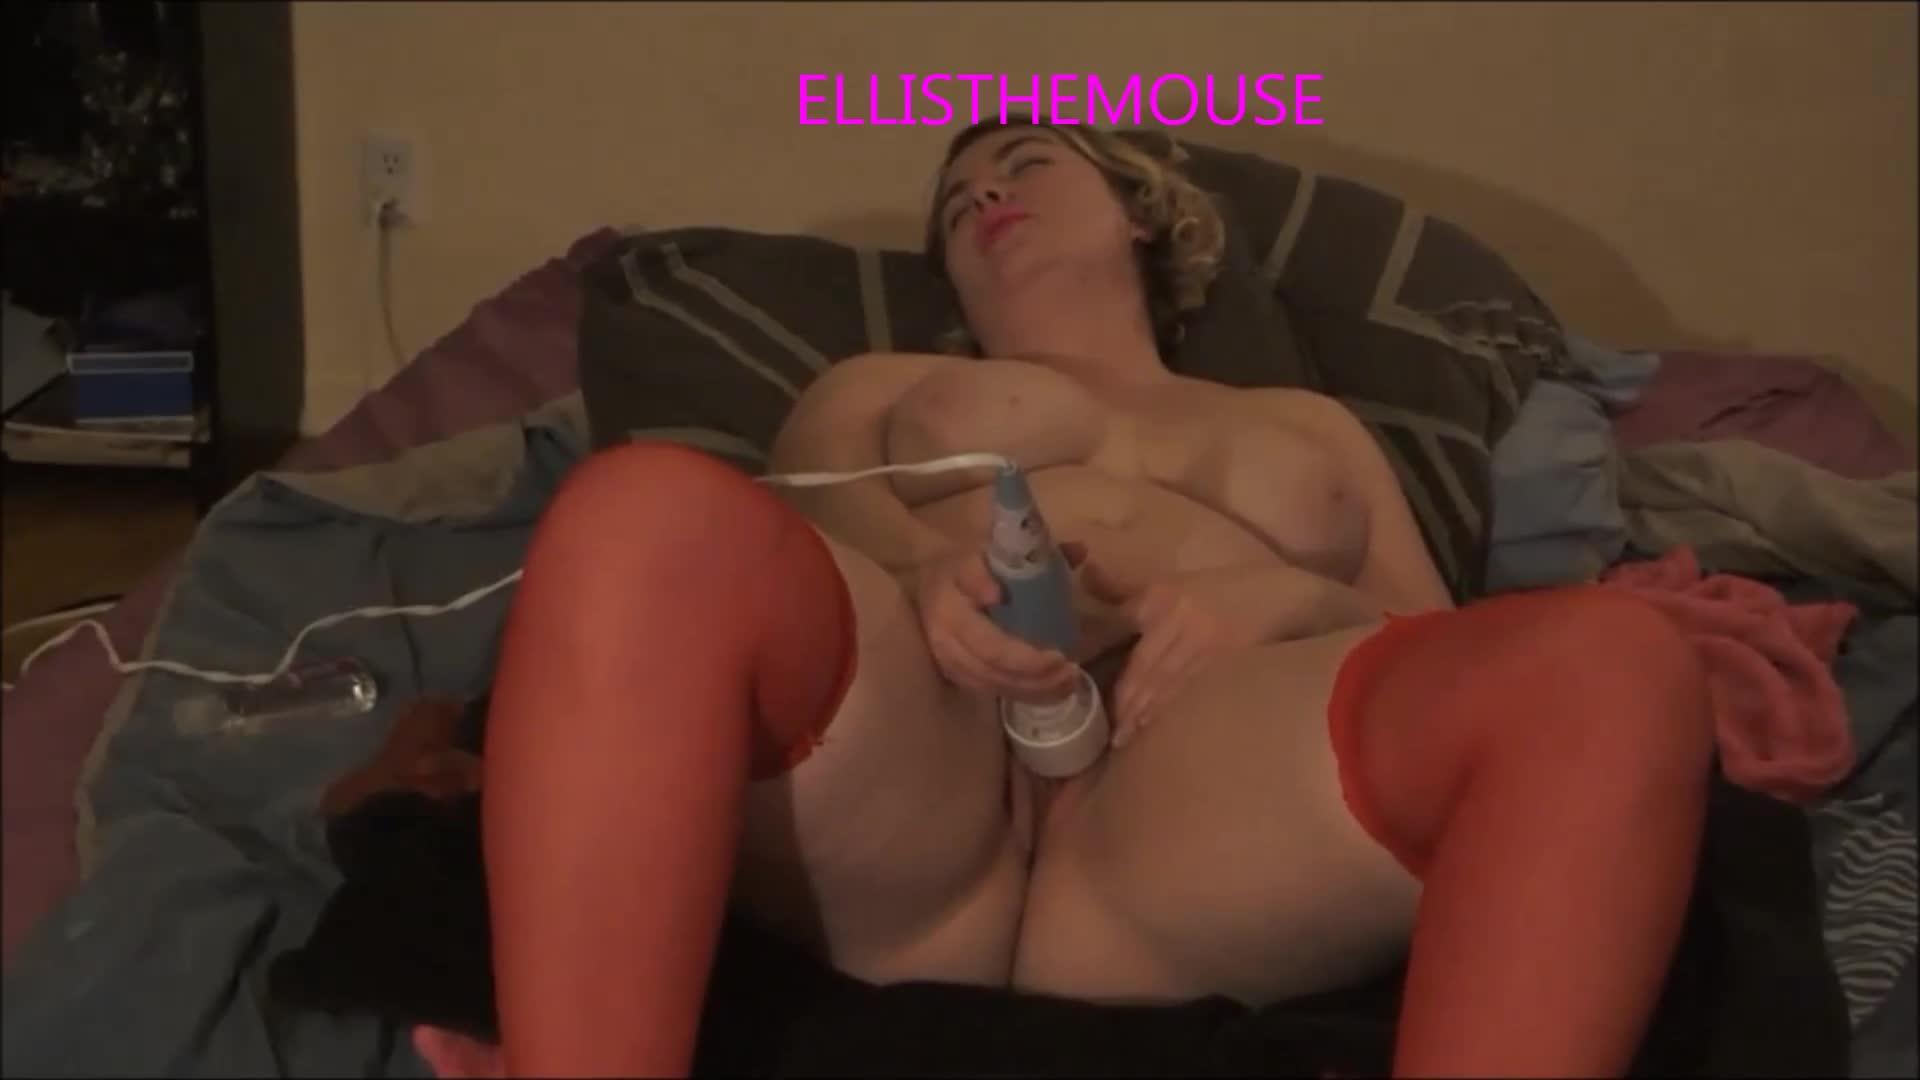 EllistheMouse'd vid